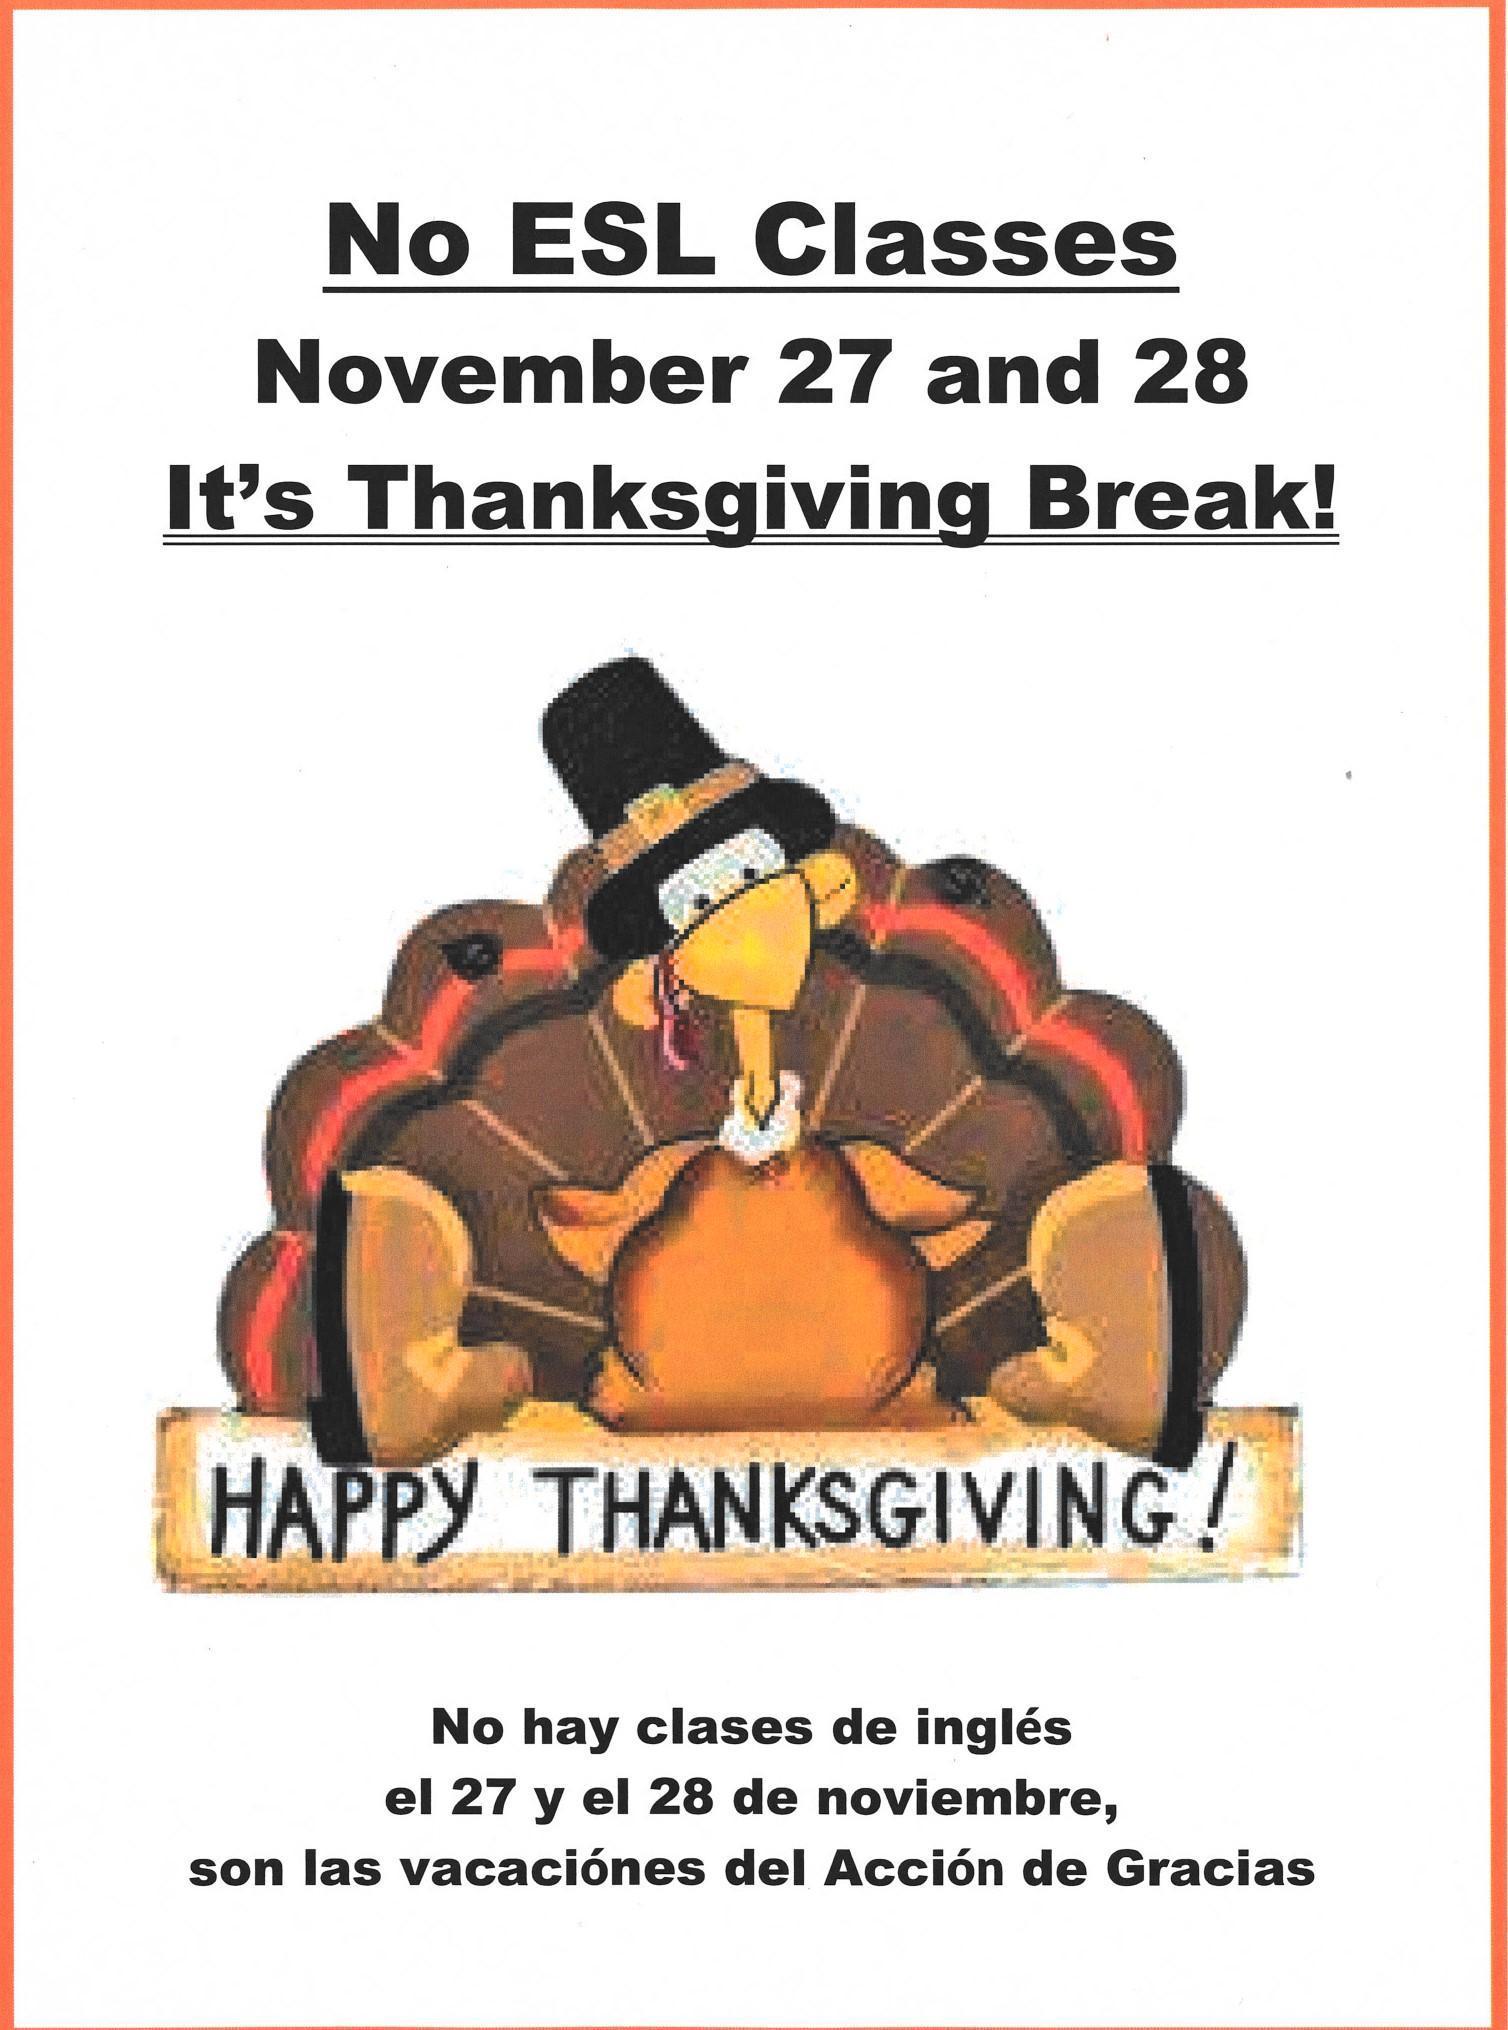 No ESL CLasses November 27 and 28, it's Thanksgiving Break poster